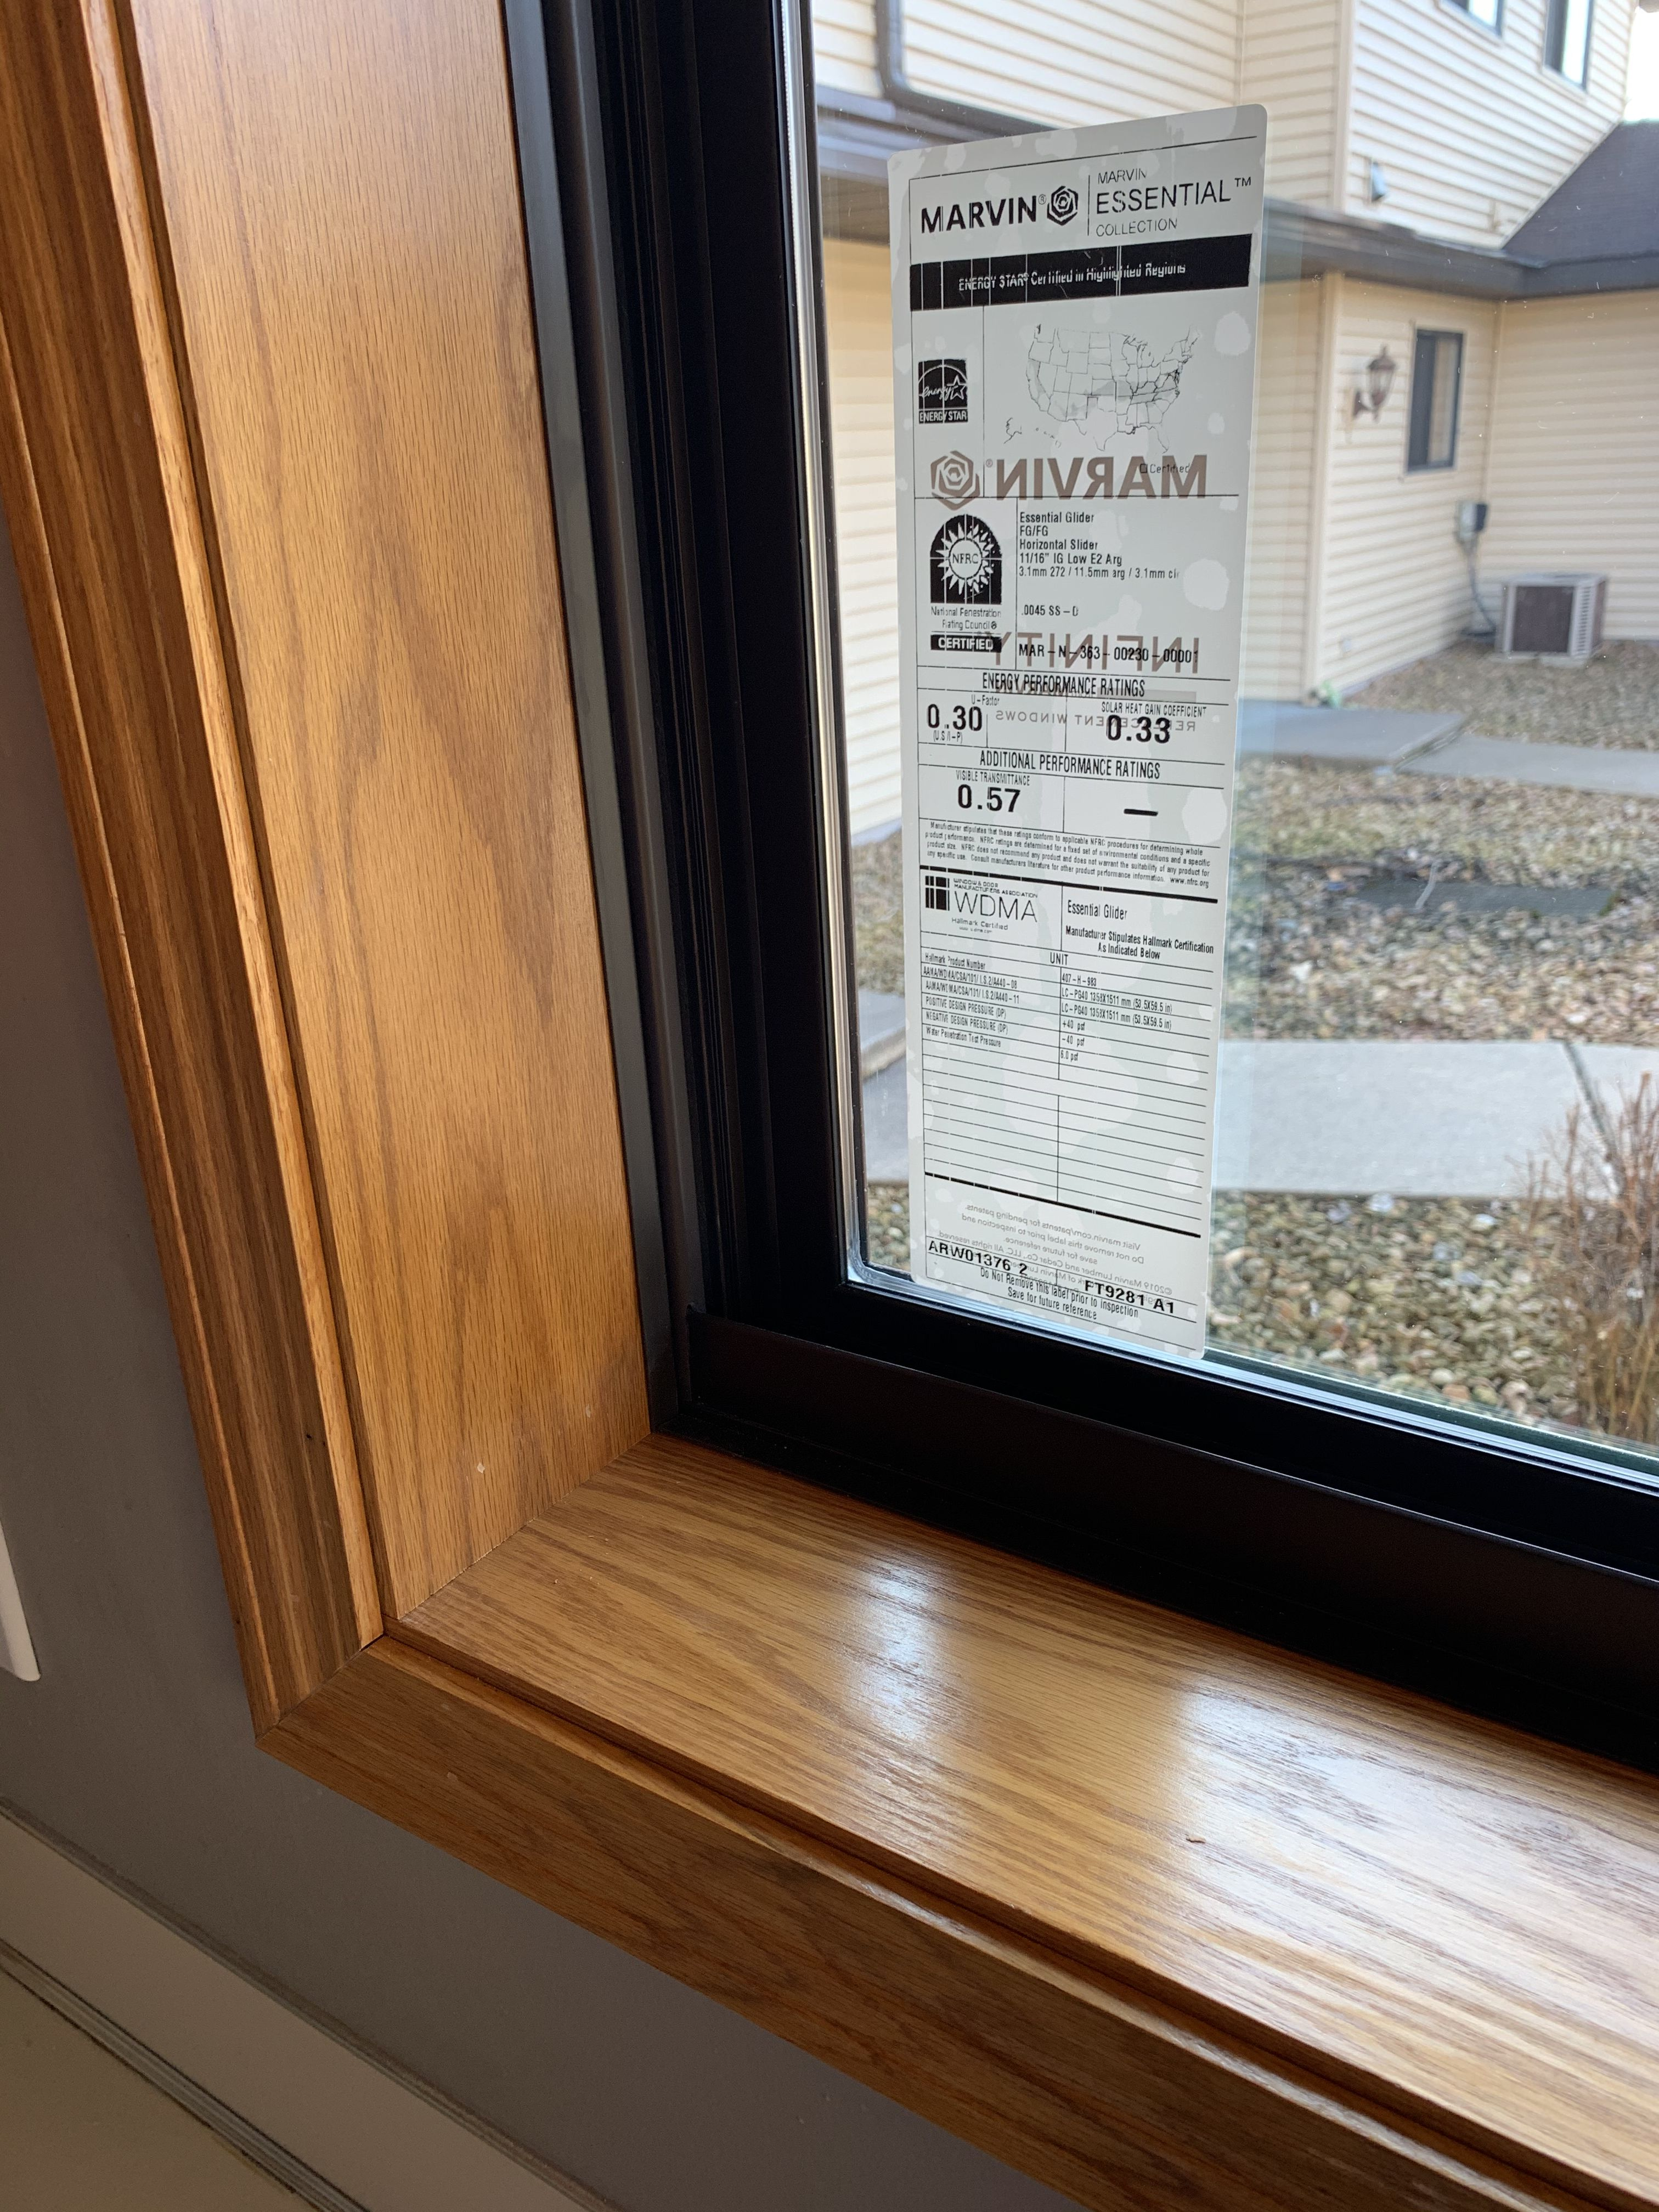 Marvin Essential Replacement Window In 2020 Marvin Windows Fiberglass Windows Energy Efficient Windows